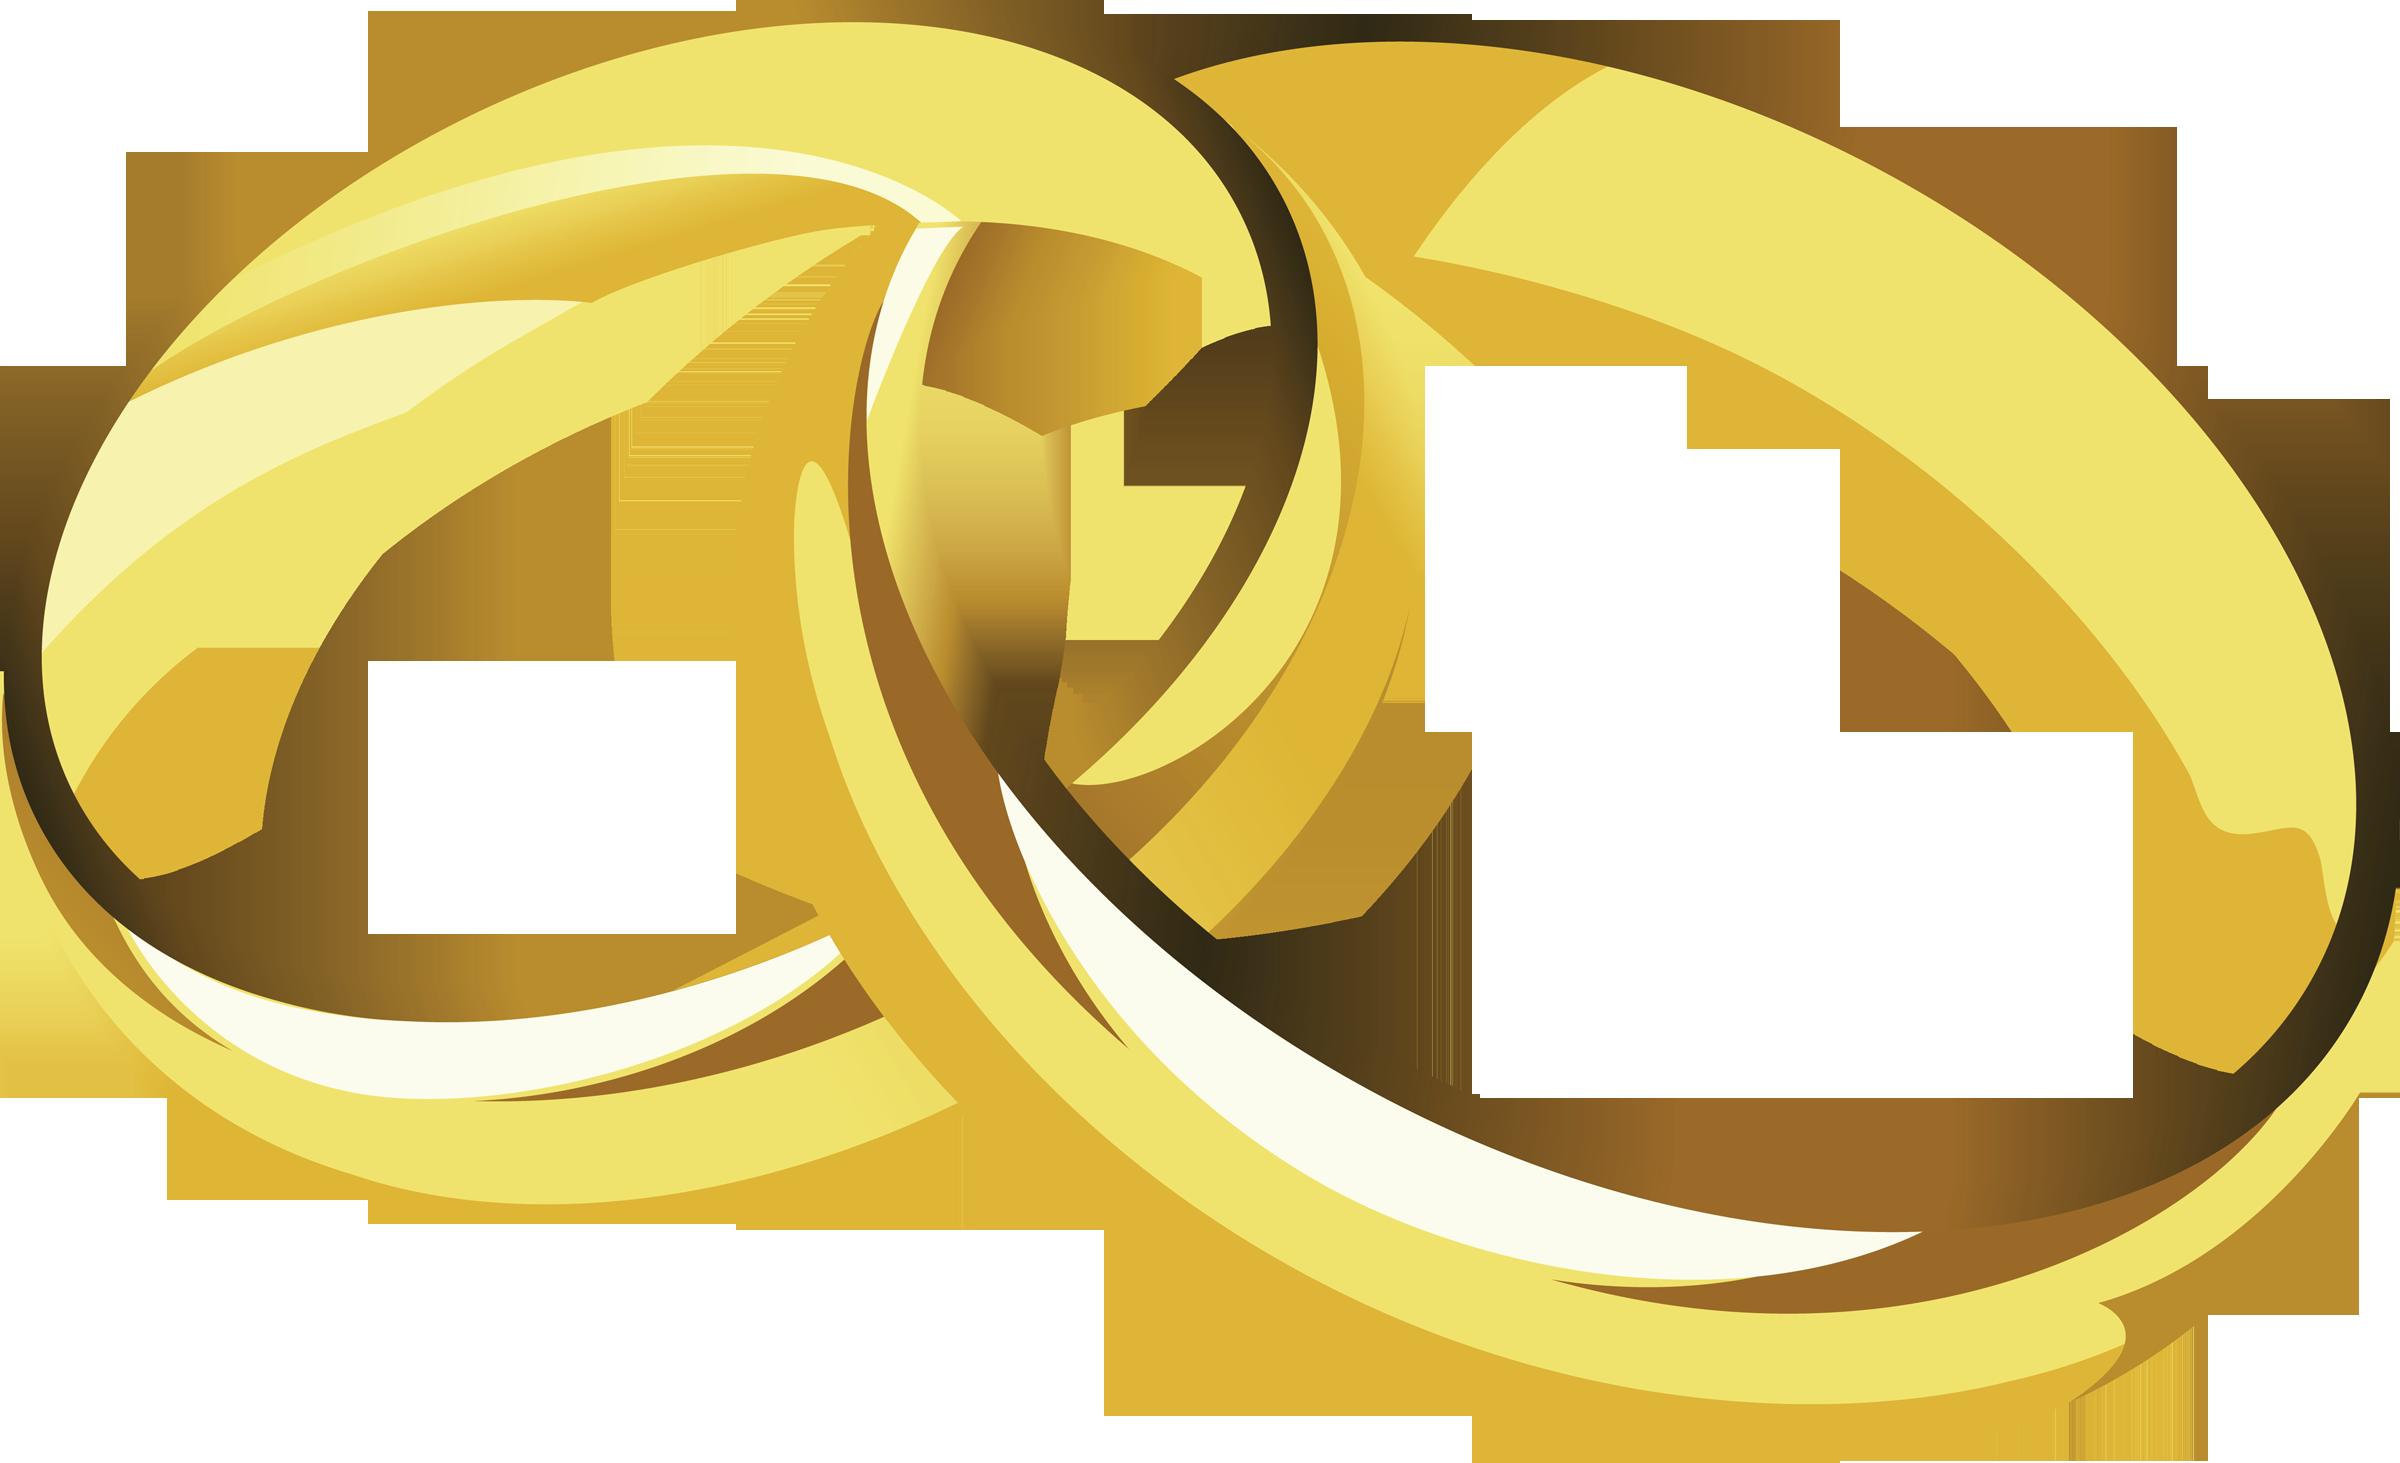 Free Cartoon Wedding Rings, Download Free Clip Art, Free.